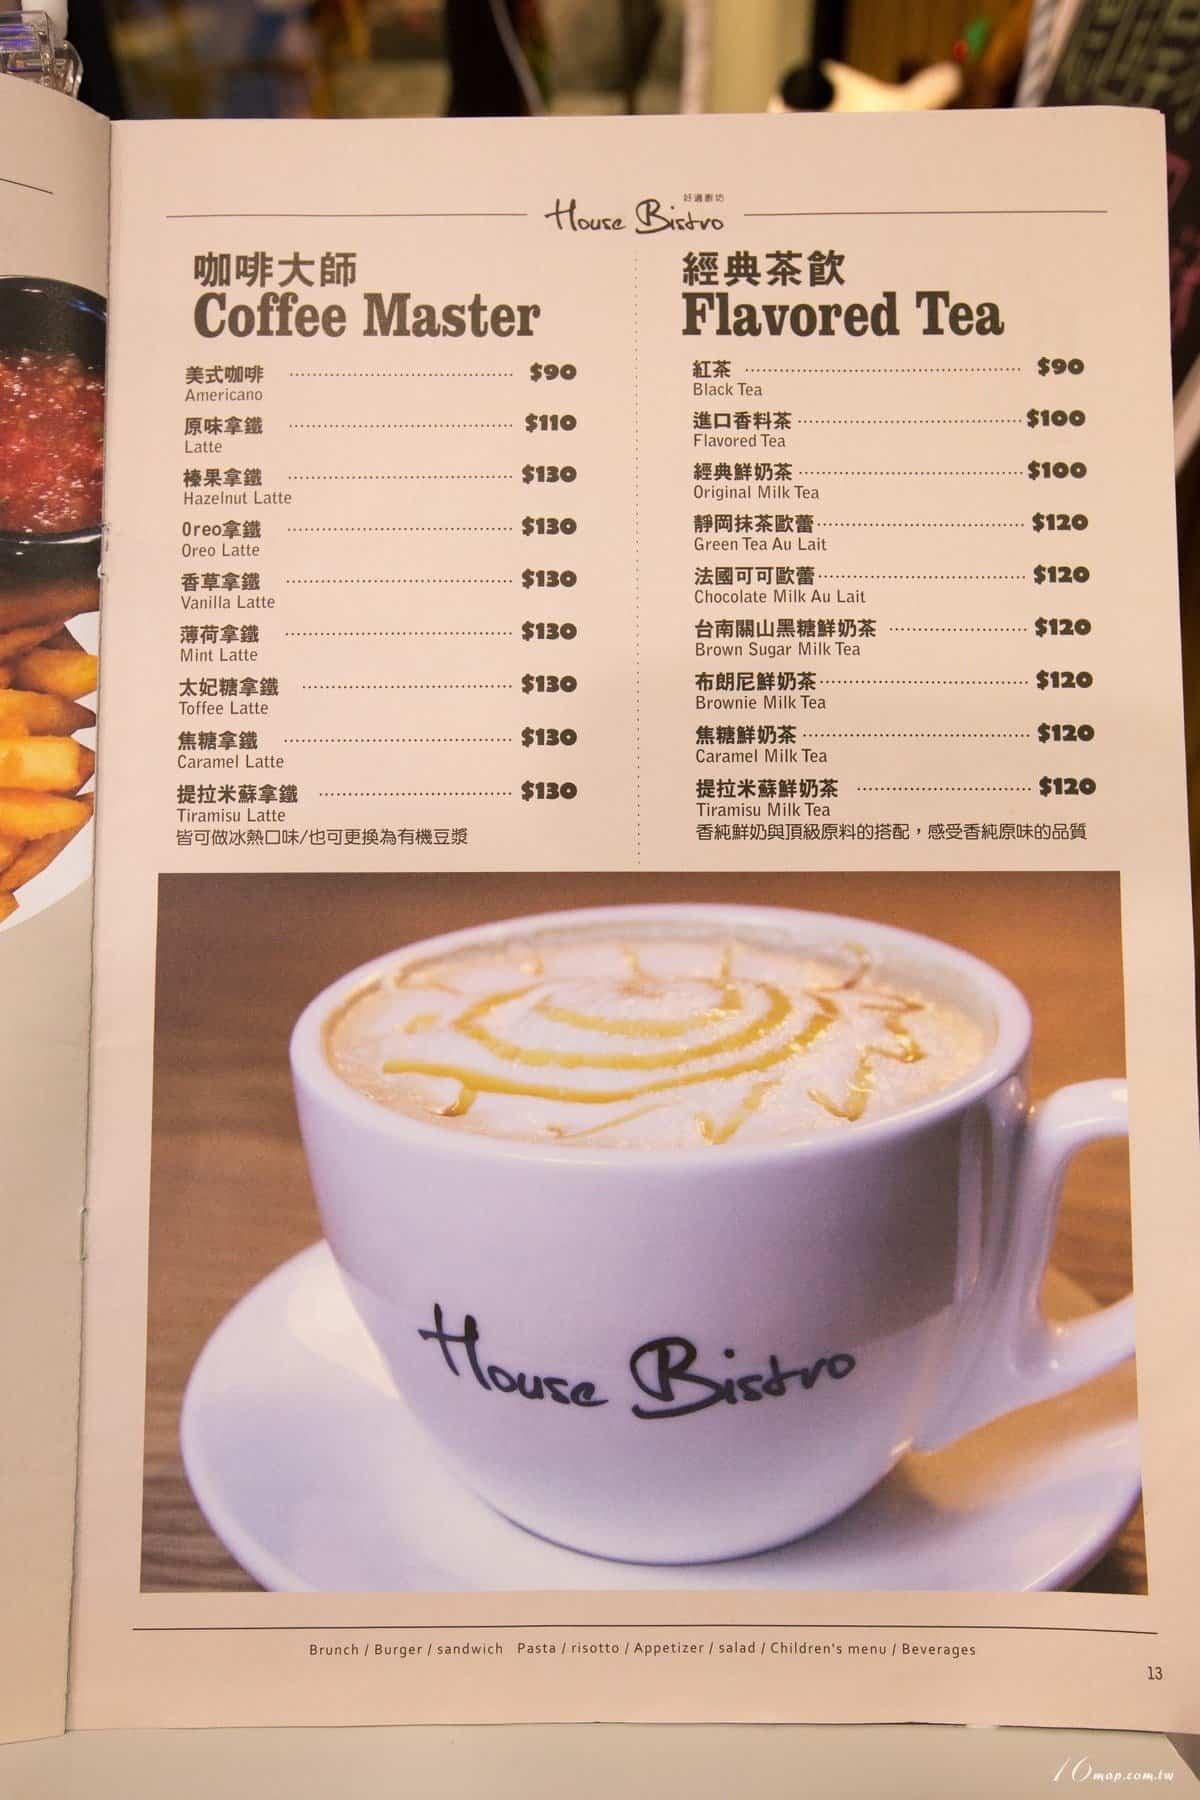 Housebistro-menu-12